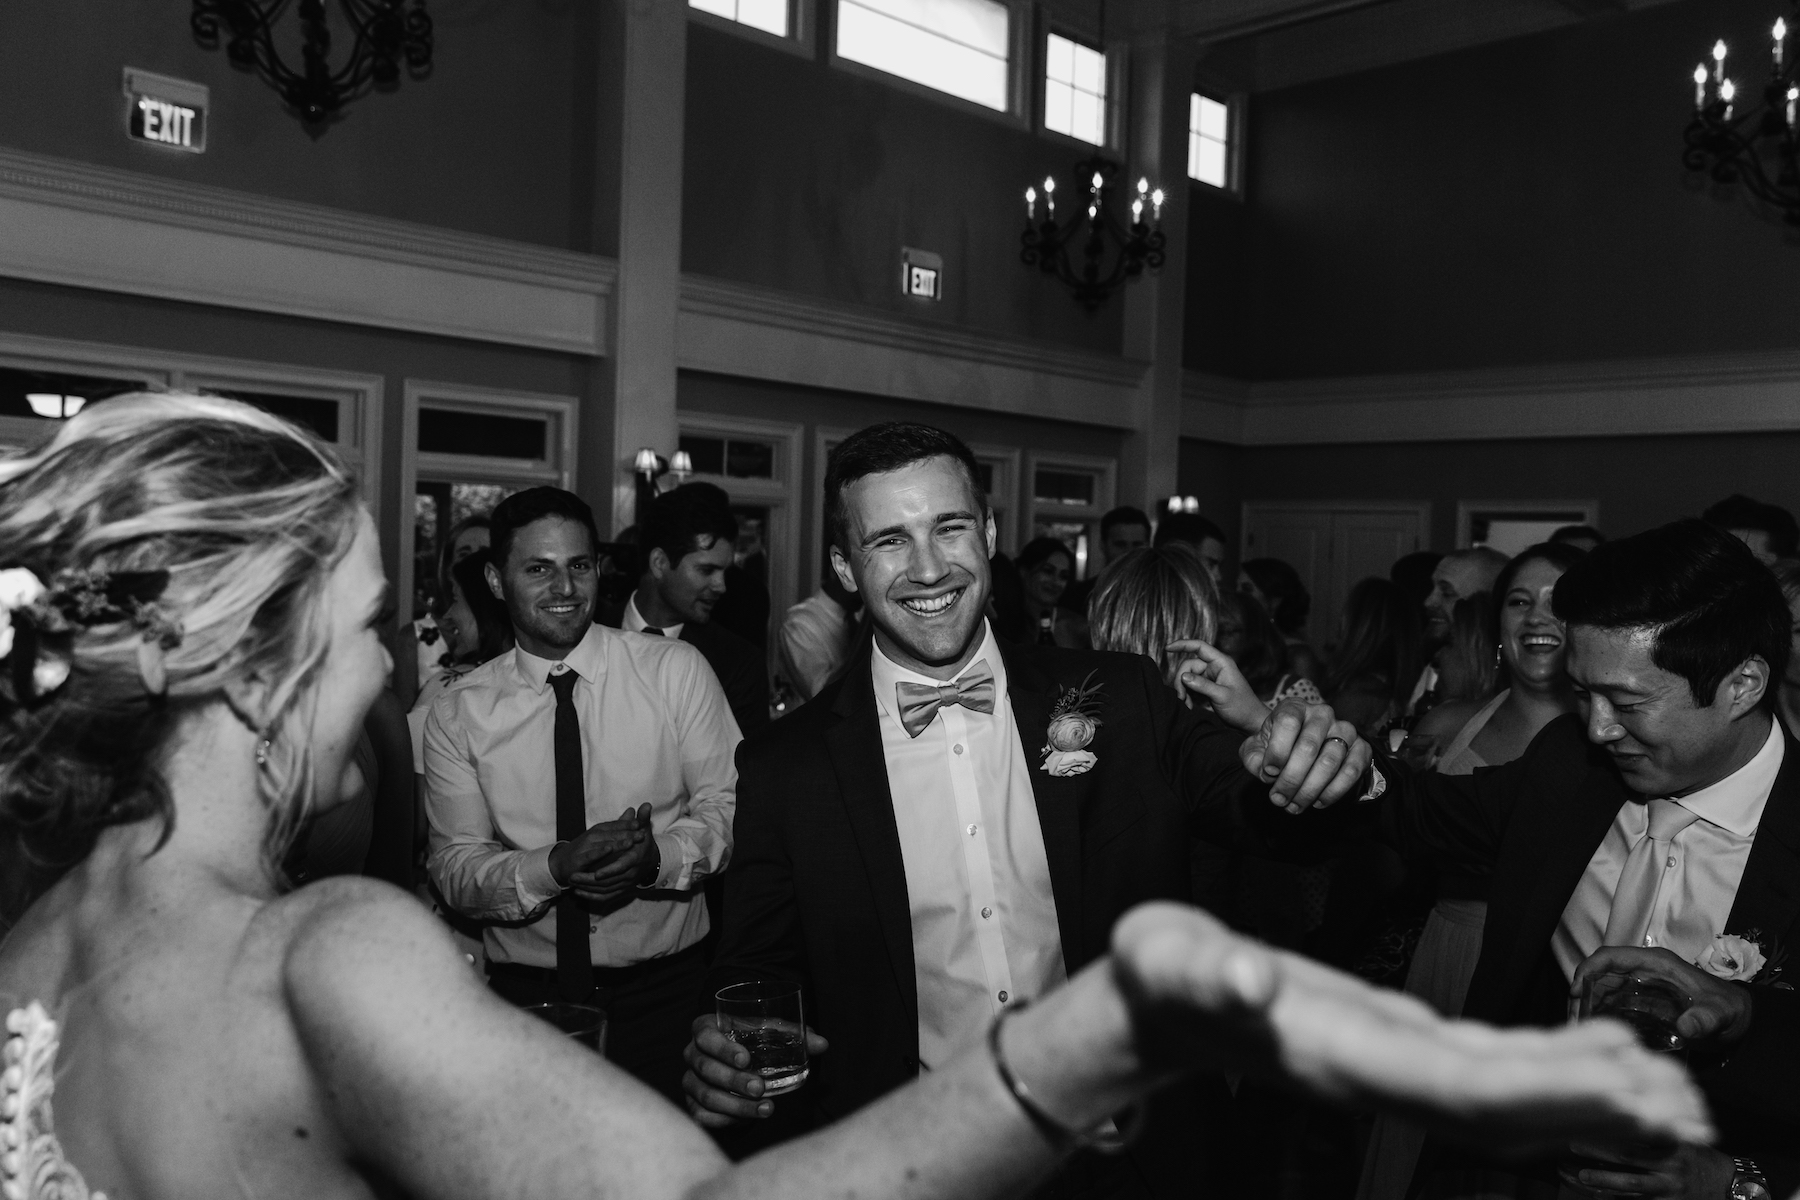 wedding-engagement-photographer-spartanburg-greenville-columbia-carolina-south-north-539.JPG